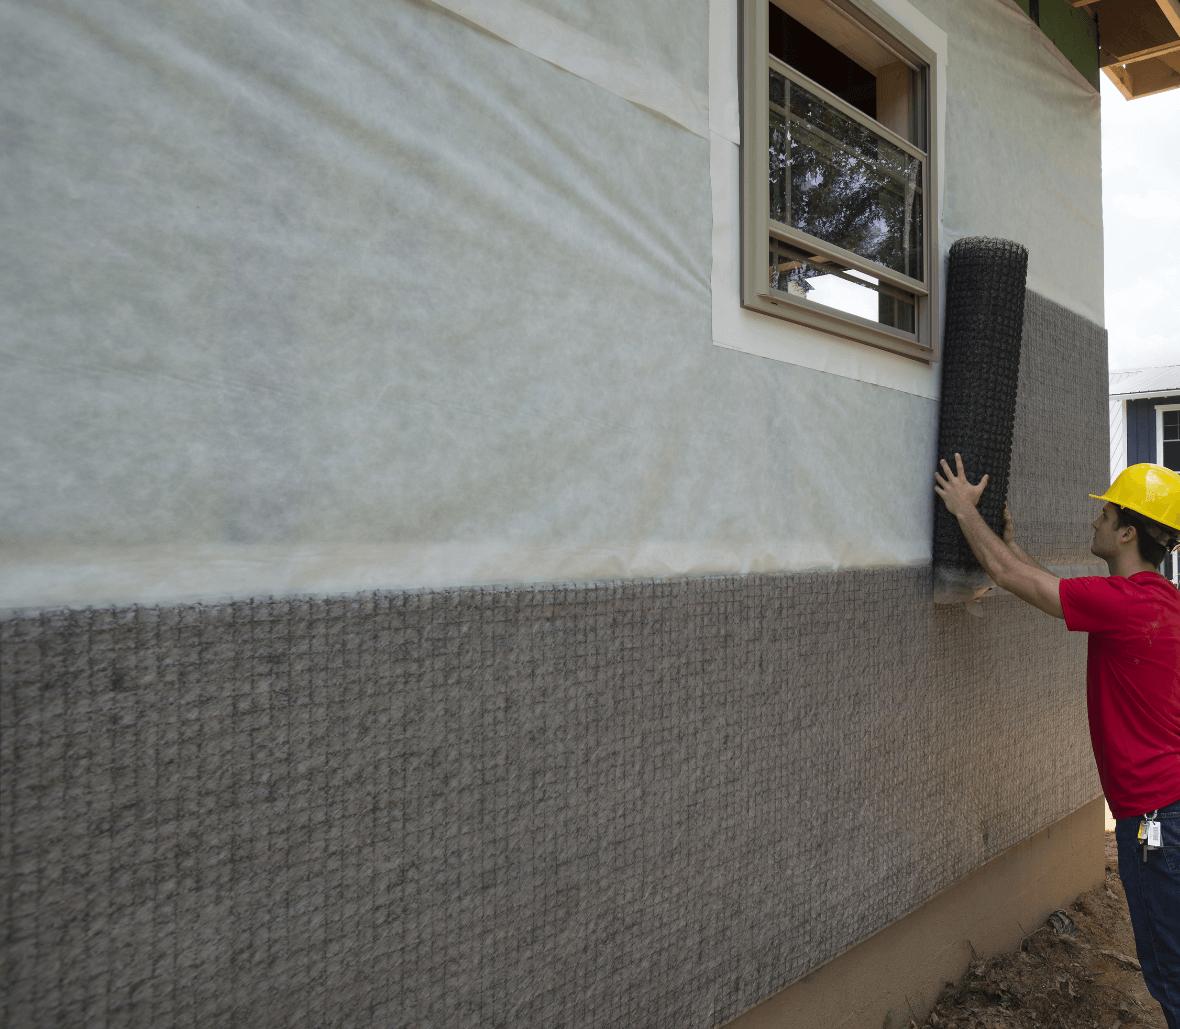 EnkaWallDrain Rainscreen system installation #1 outer wall envelope rolled out Credits Enka Solutions_©Low&Bonar